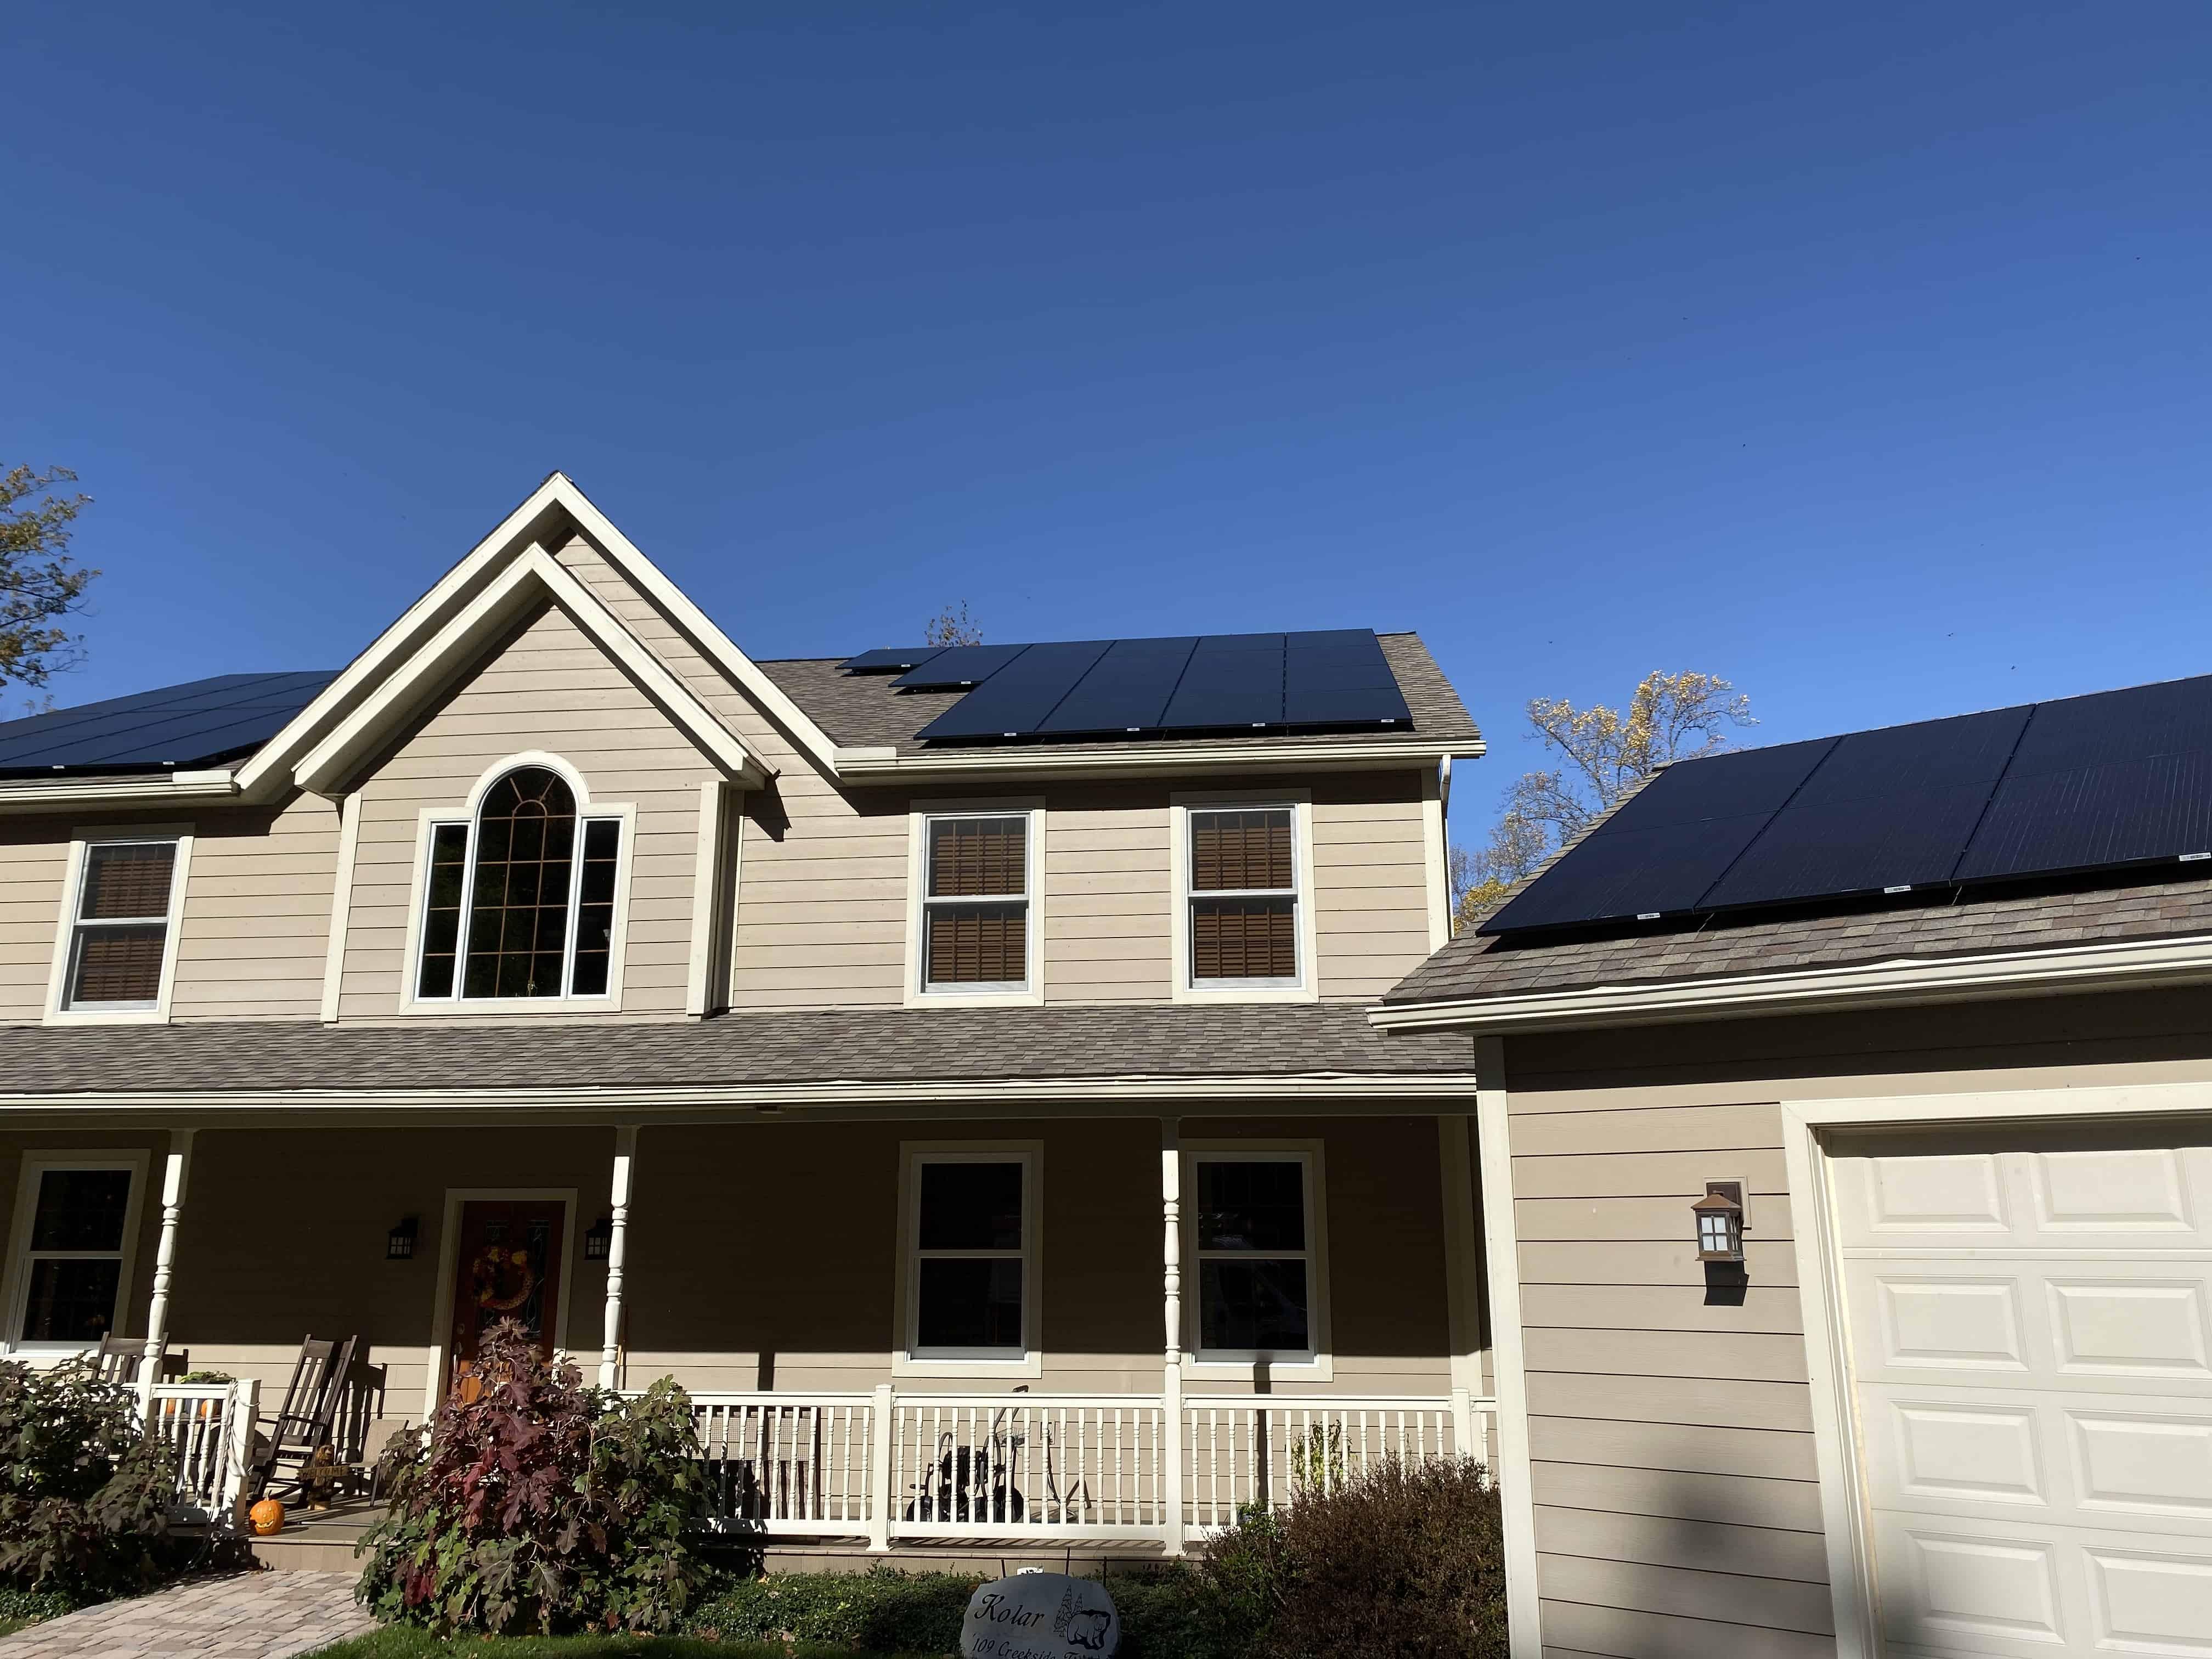 Central Pennsylvania Residential Solar System